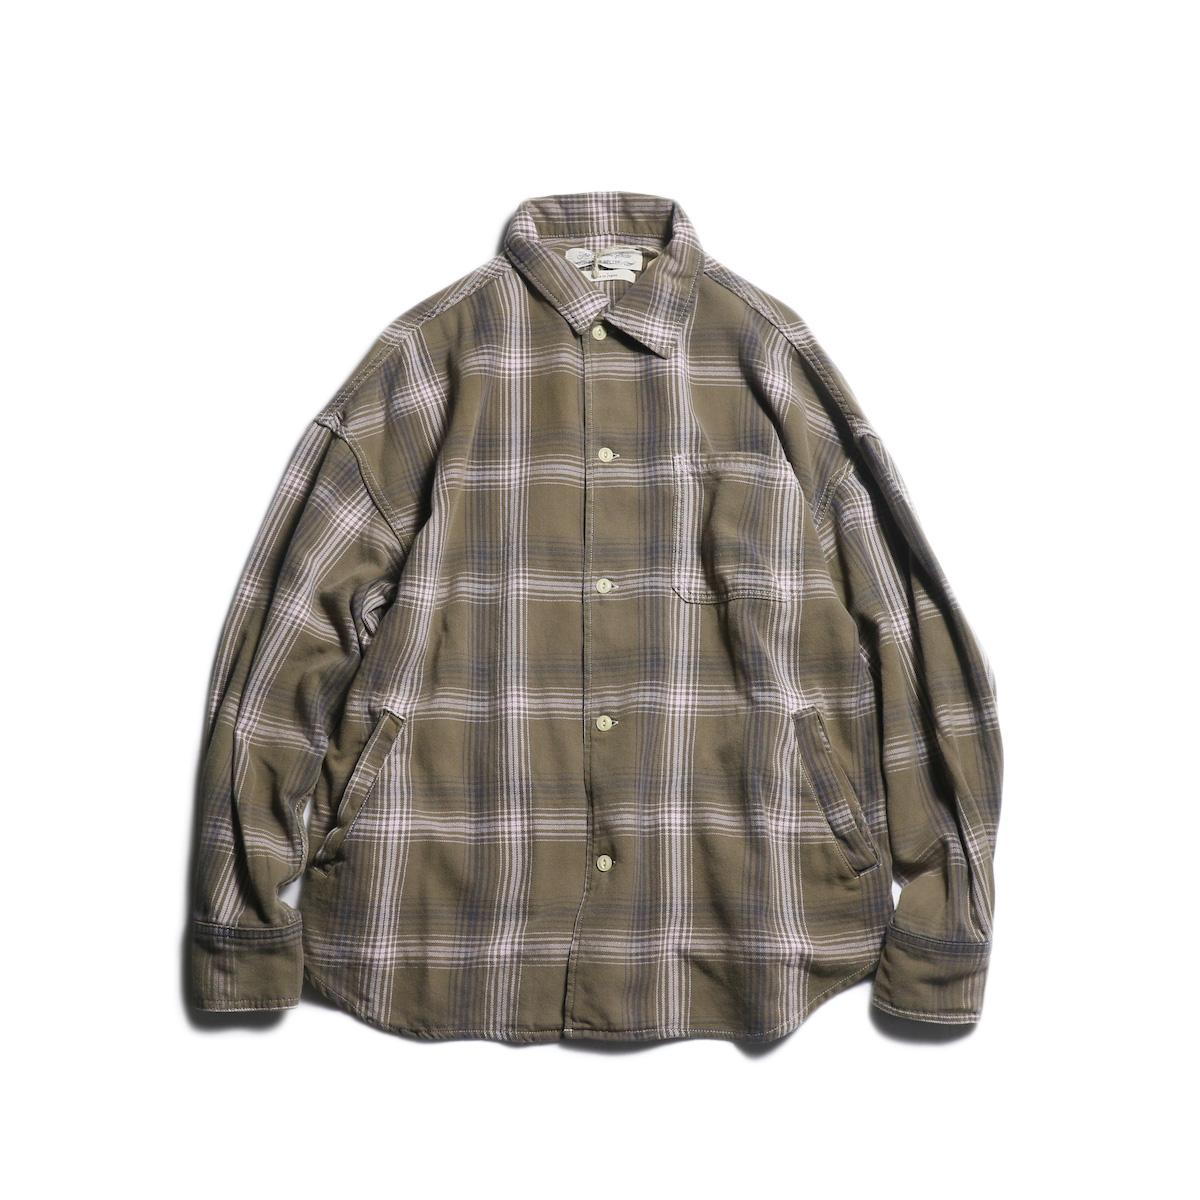 REMI RELIEF / チェックオープンシャツ (Brown)